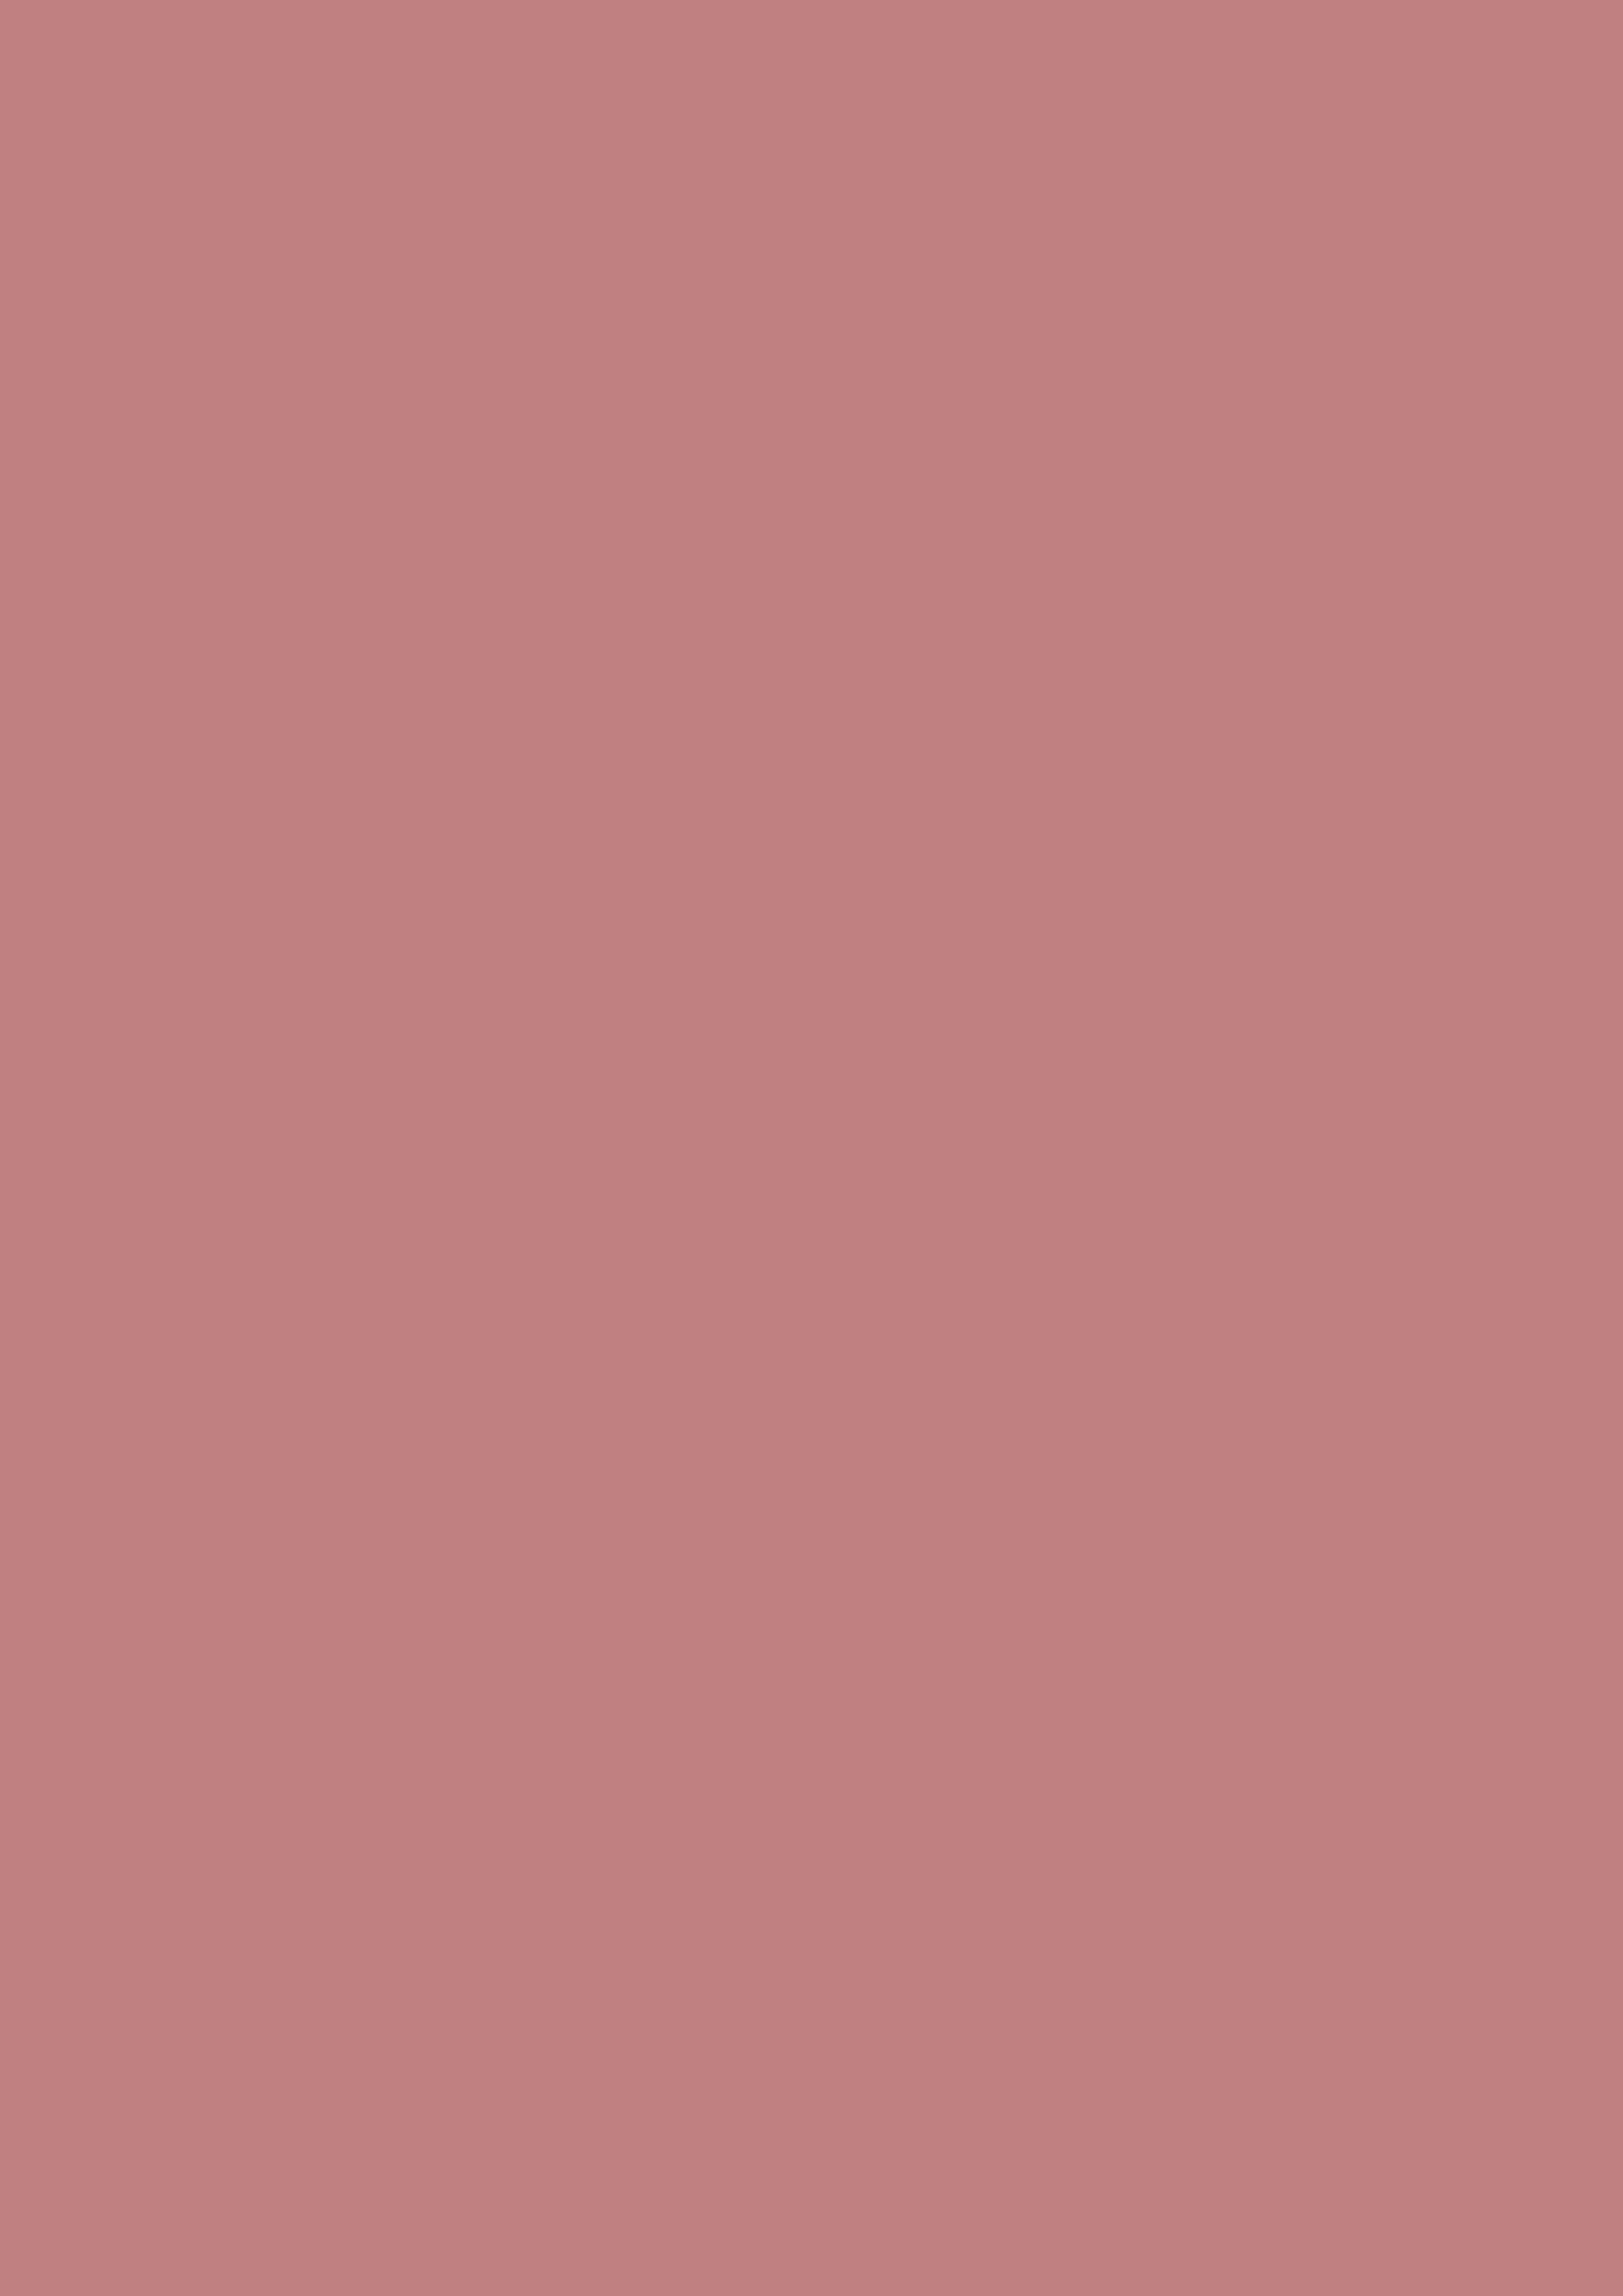 2480x3508 Old Rose Solid Color Background